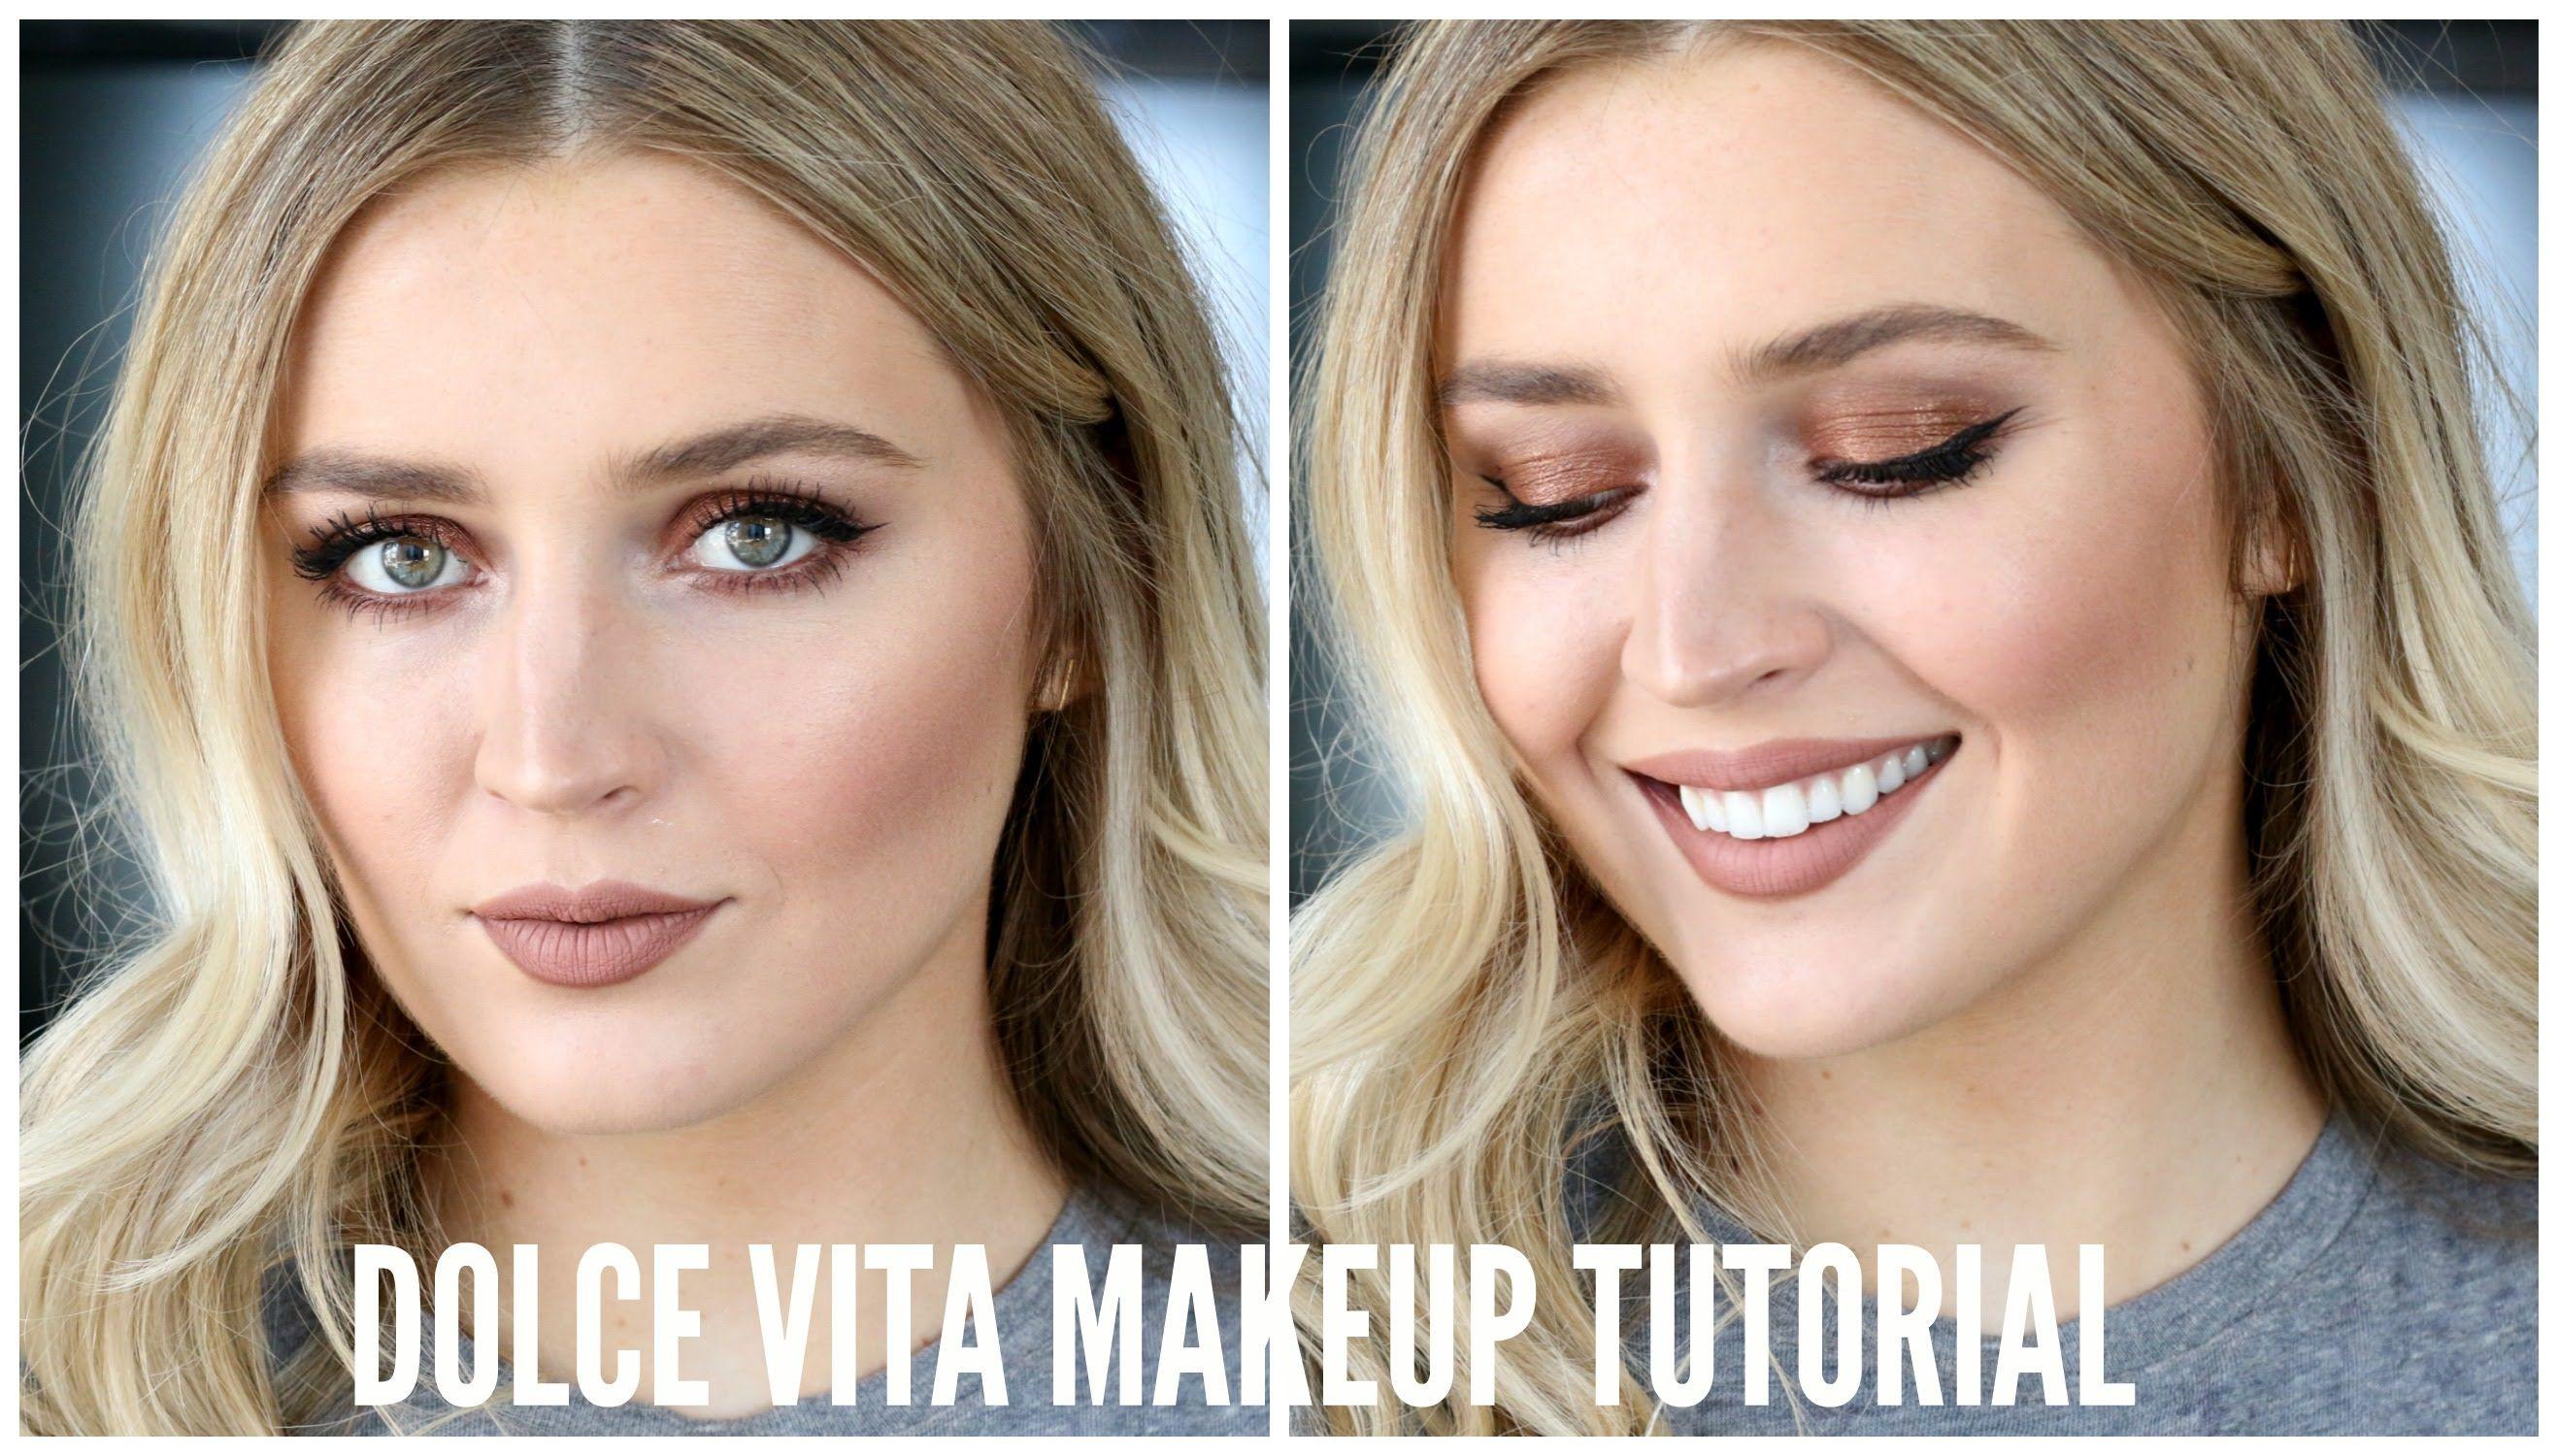 The Dolce Vita Makeup Look Makeup Pinterest Charlotte